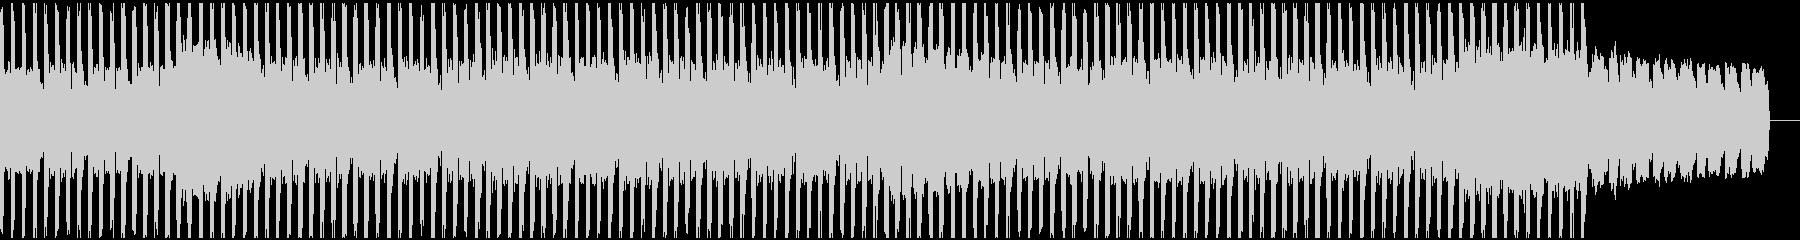 EDMっぽいBGMです。の未再生の波形